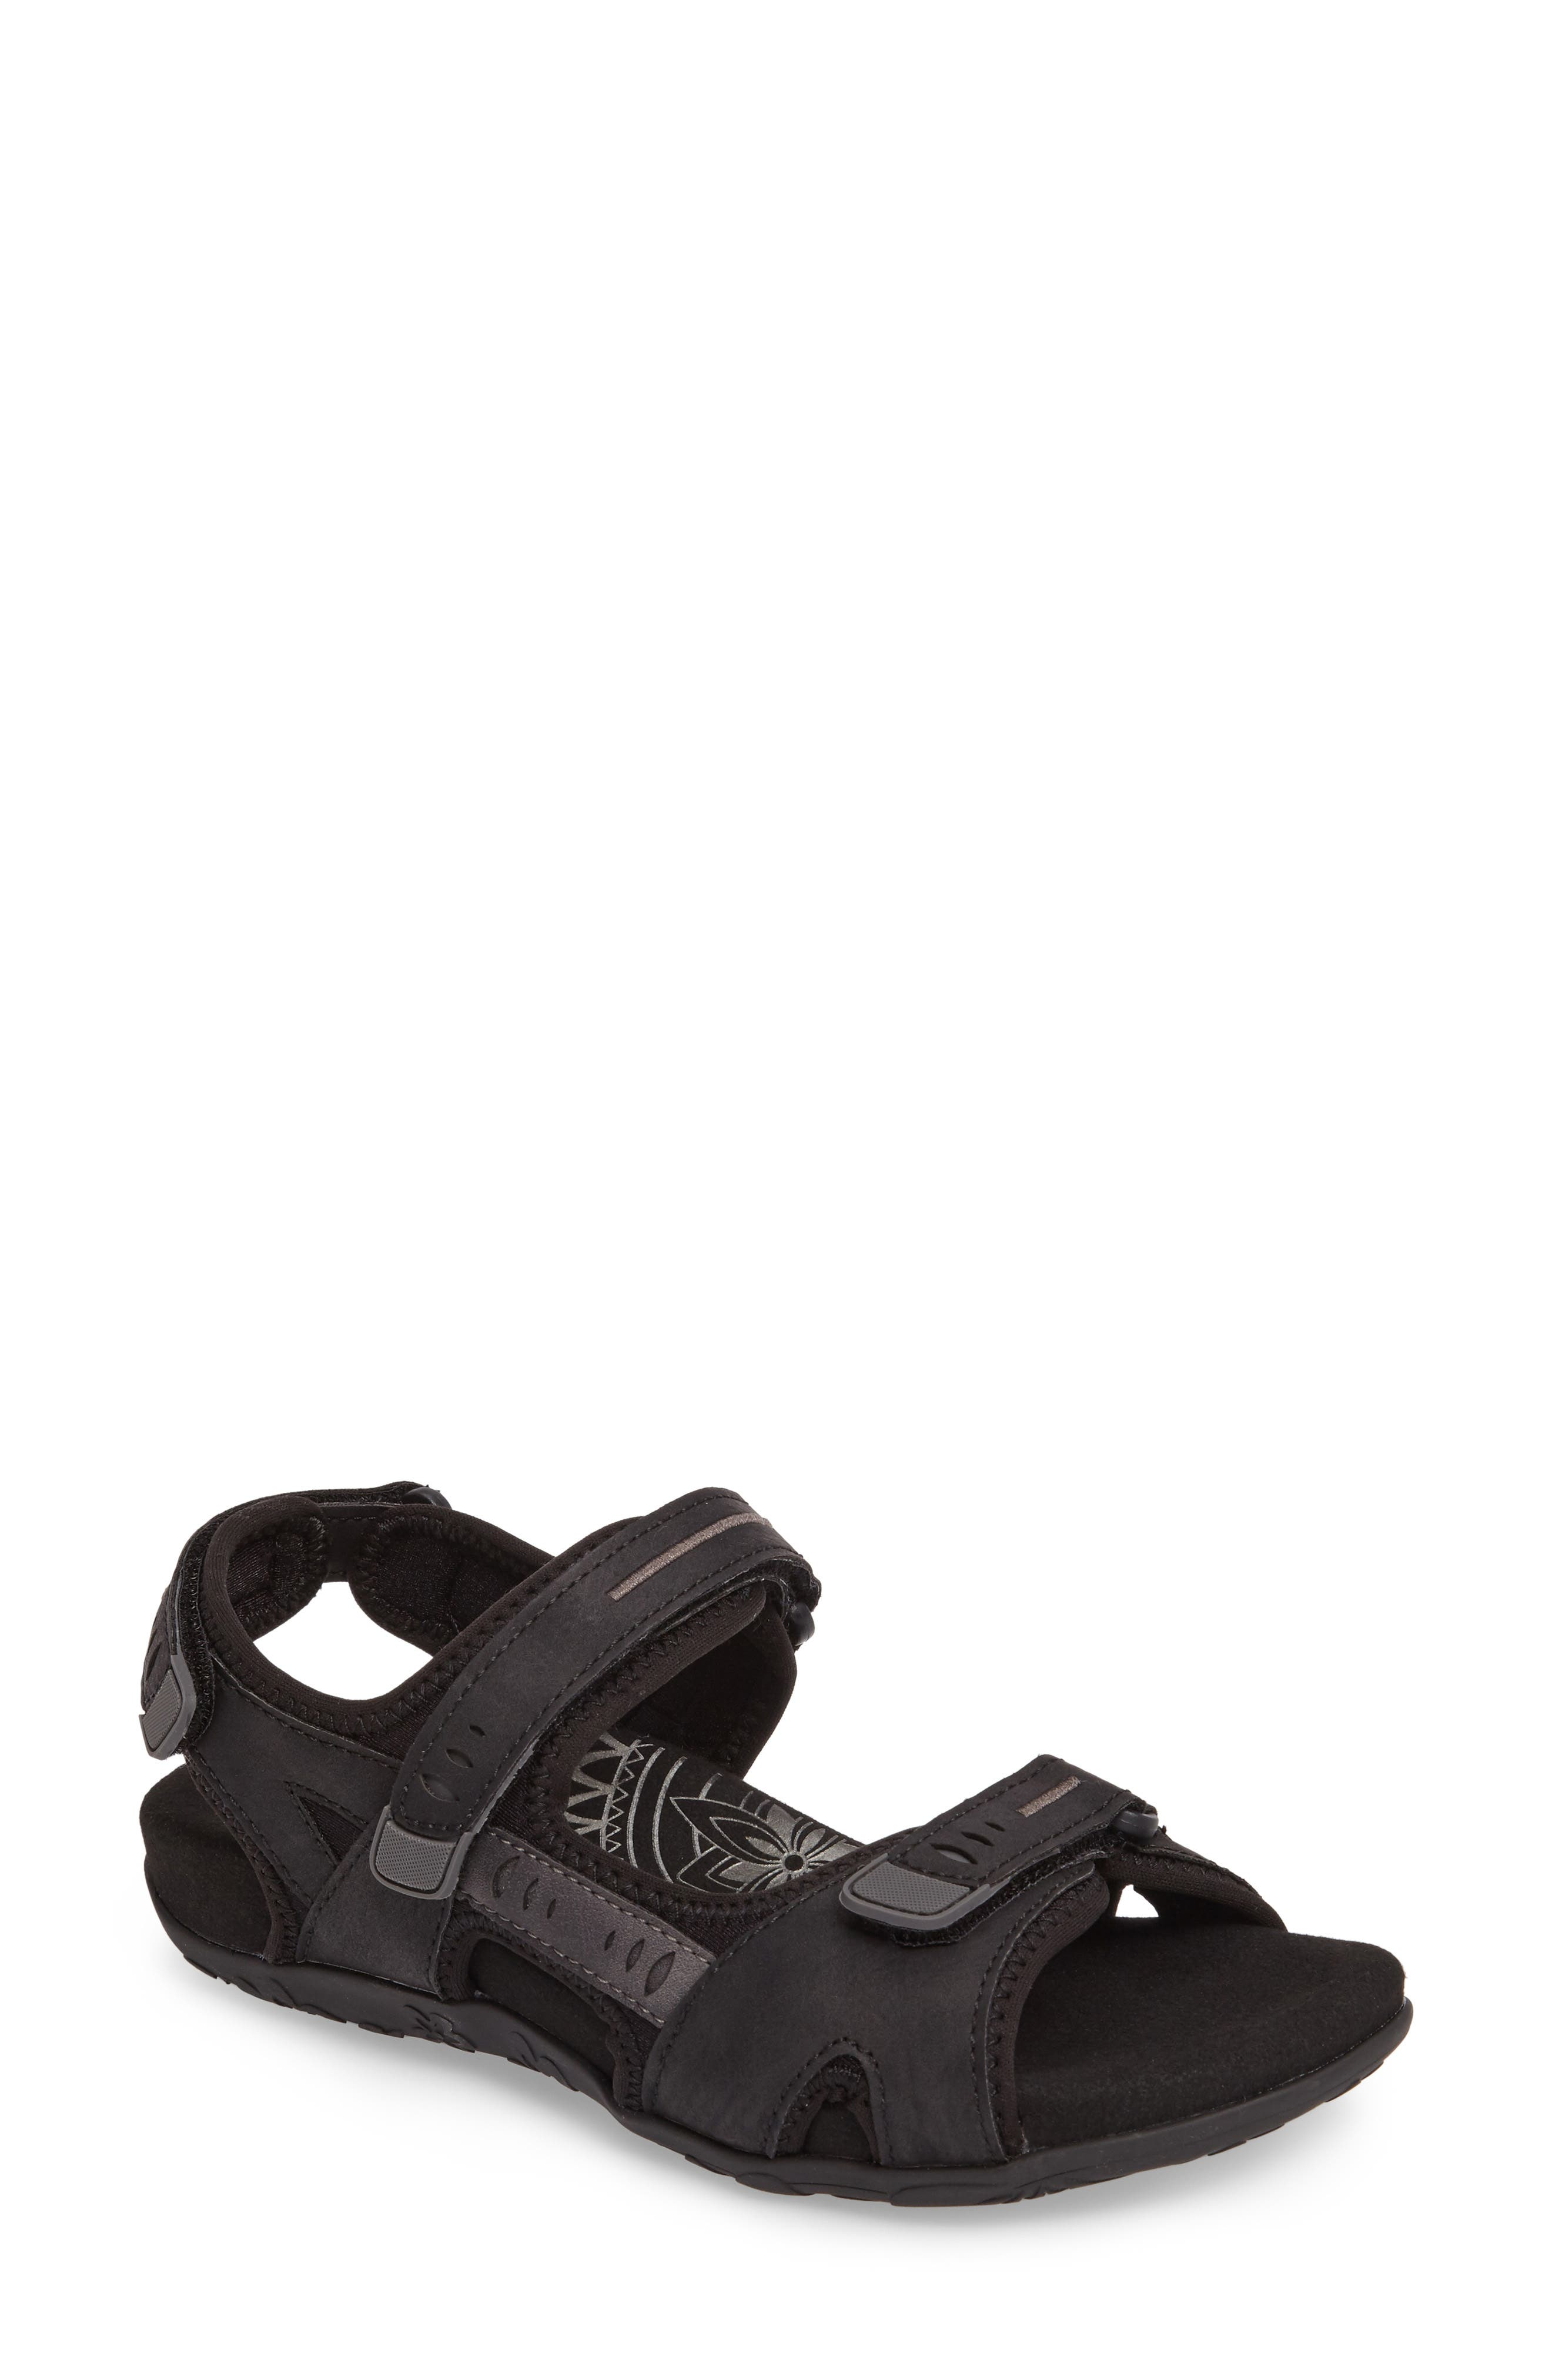 Bree Sport Sandal,                         Main,                         color, 001